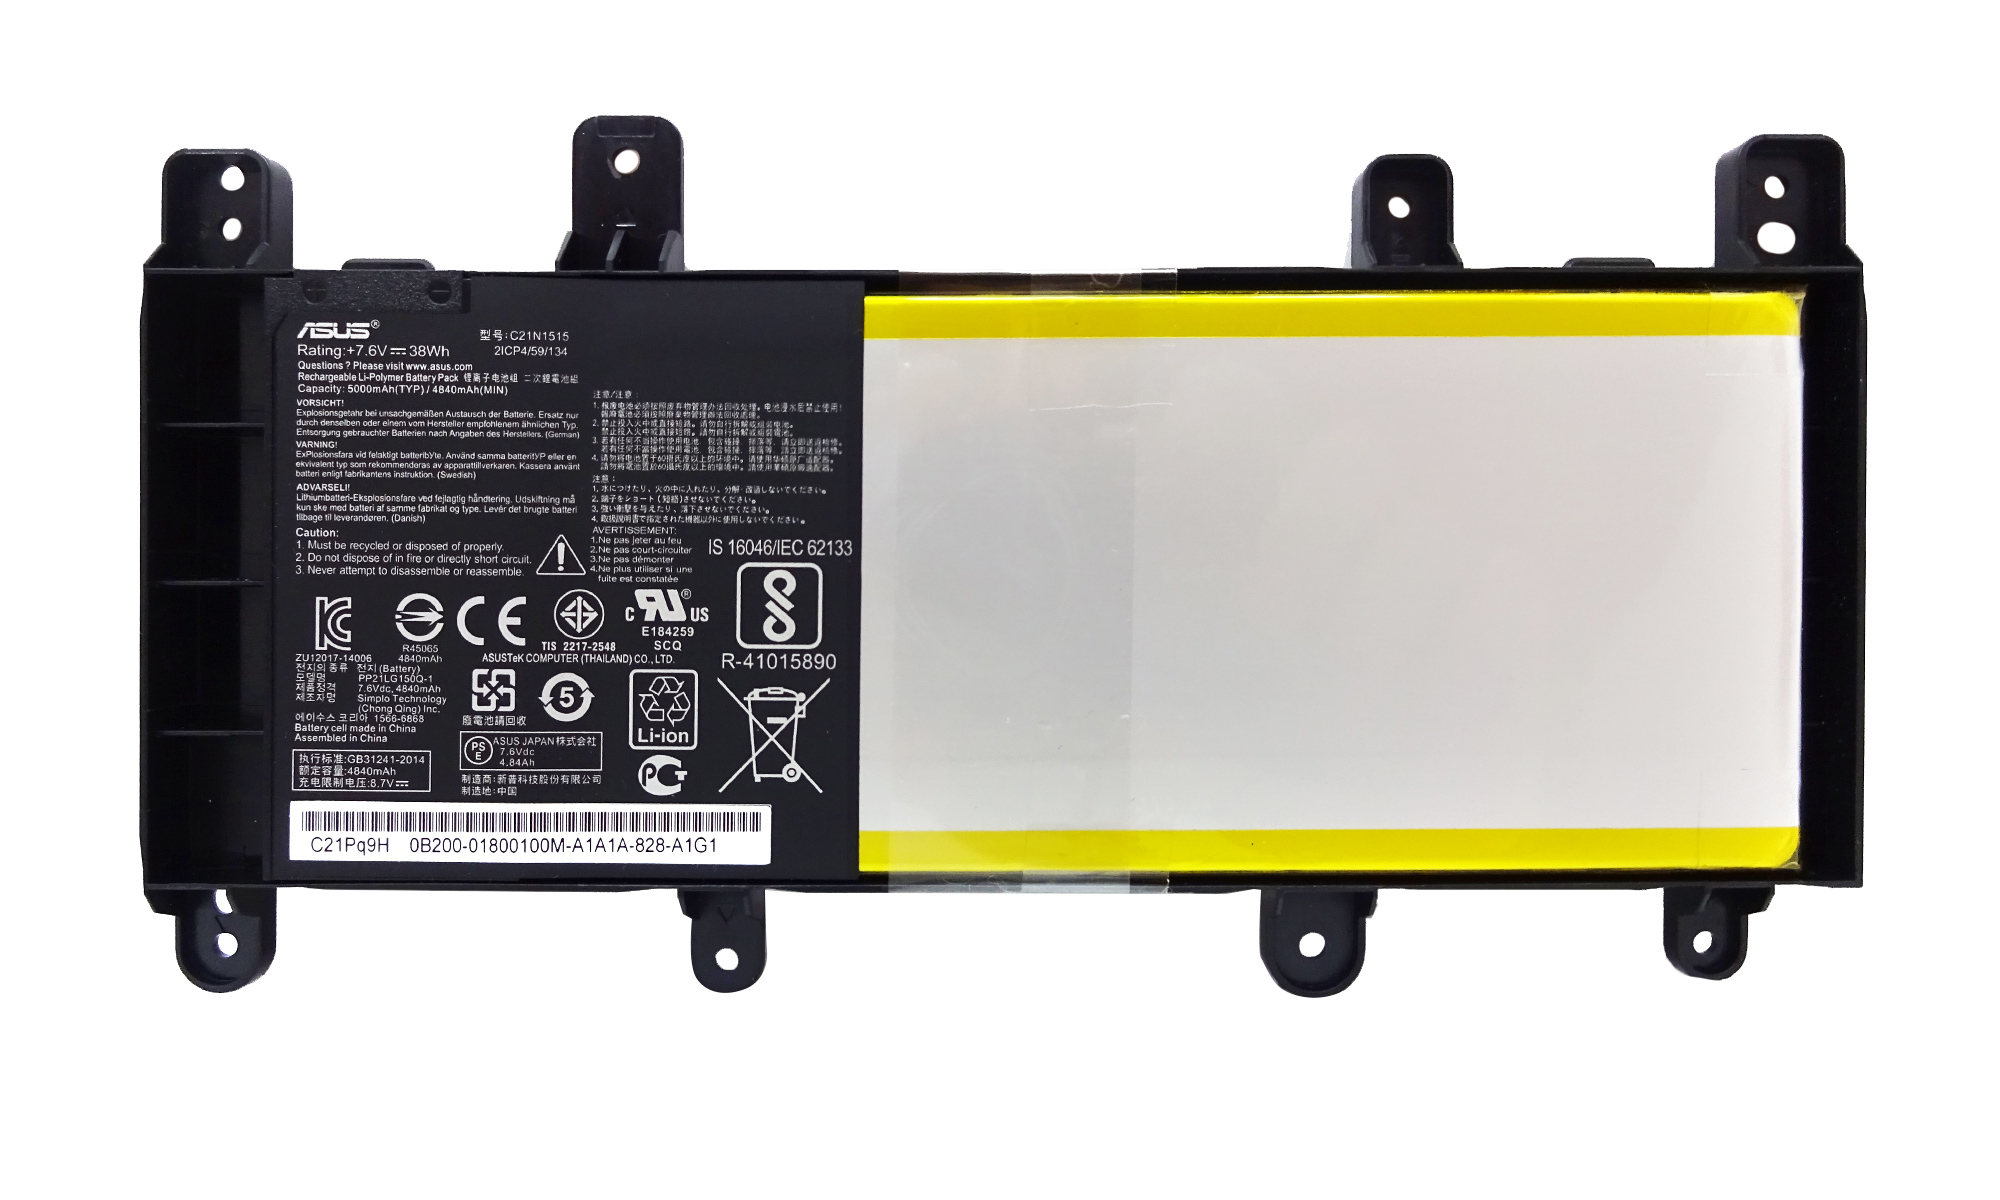 Baterie originala laptop ASUS X756UA, X756UB, X756UJ, X756UQ, X756UV, X756UW, X756UX, model C21N1515